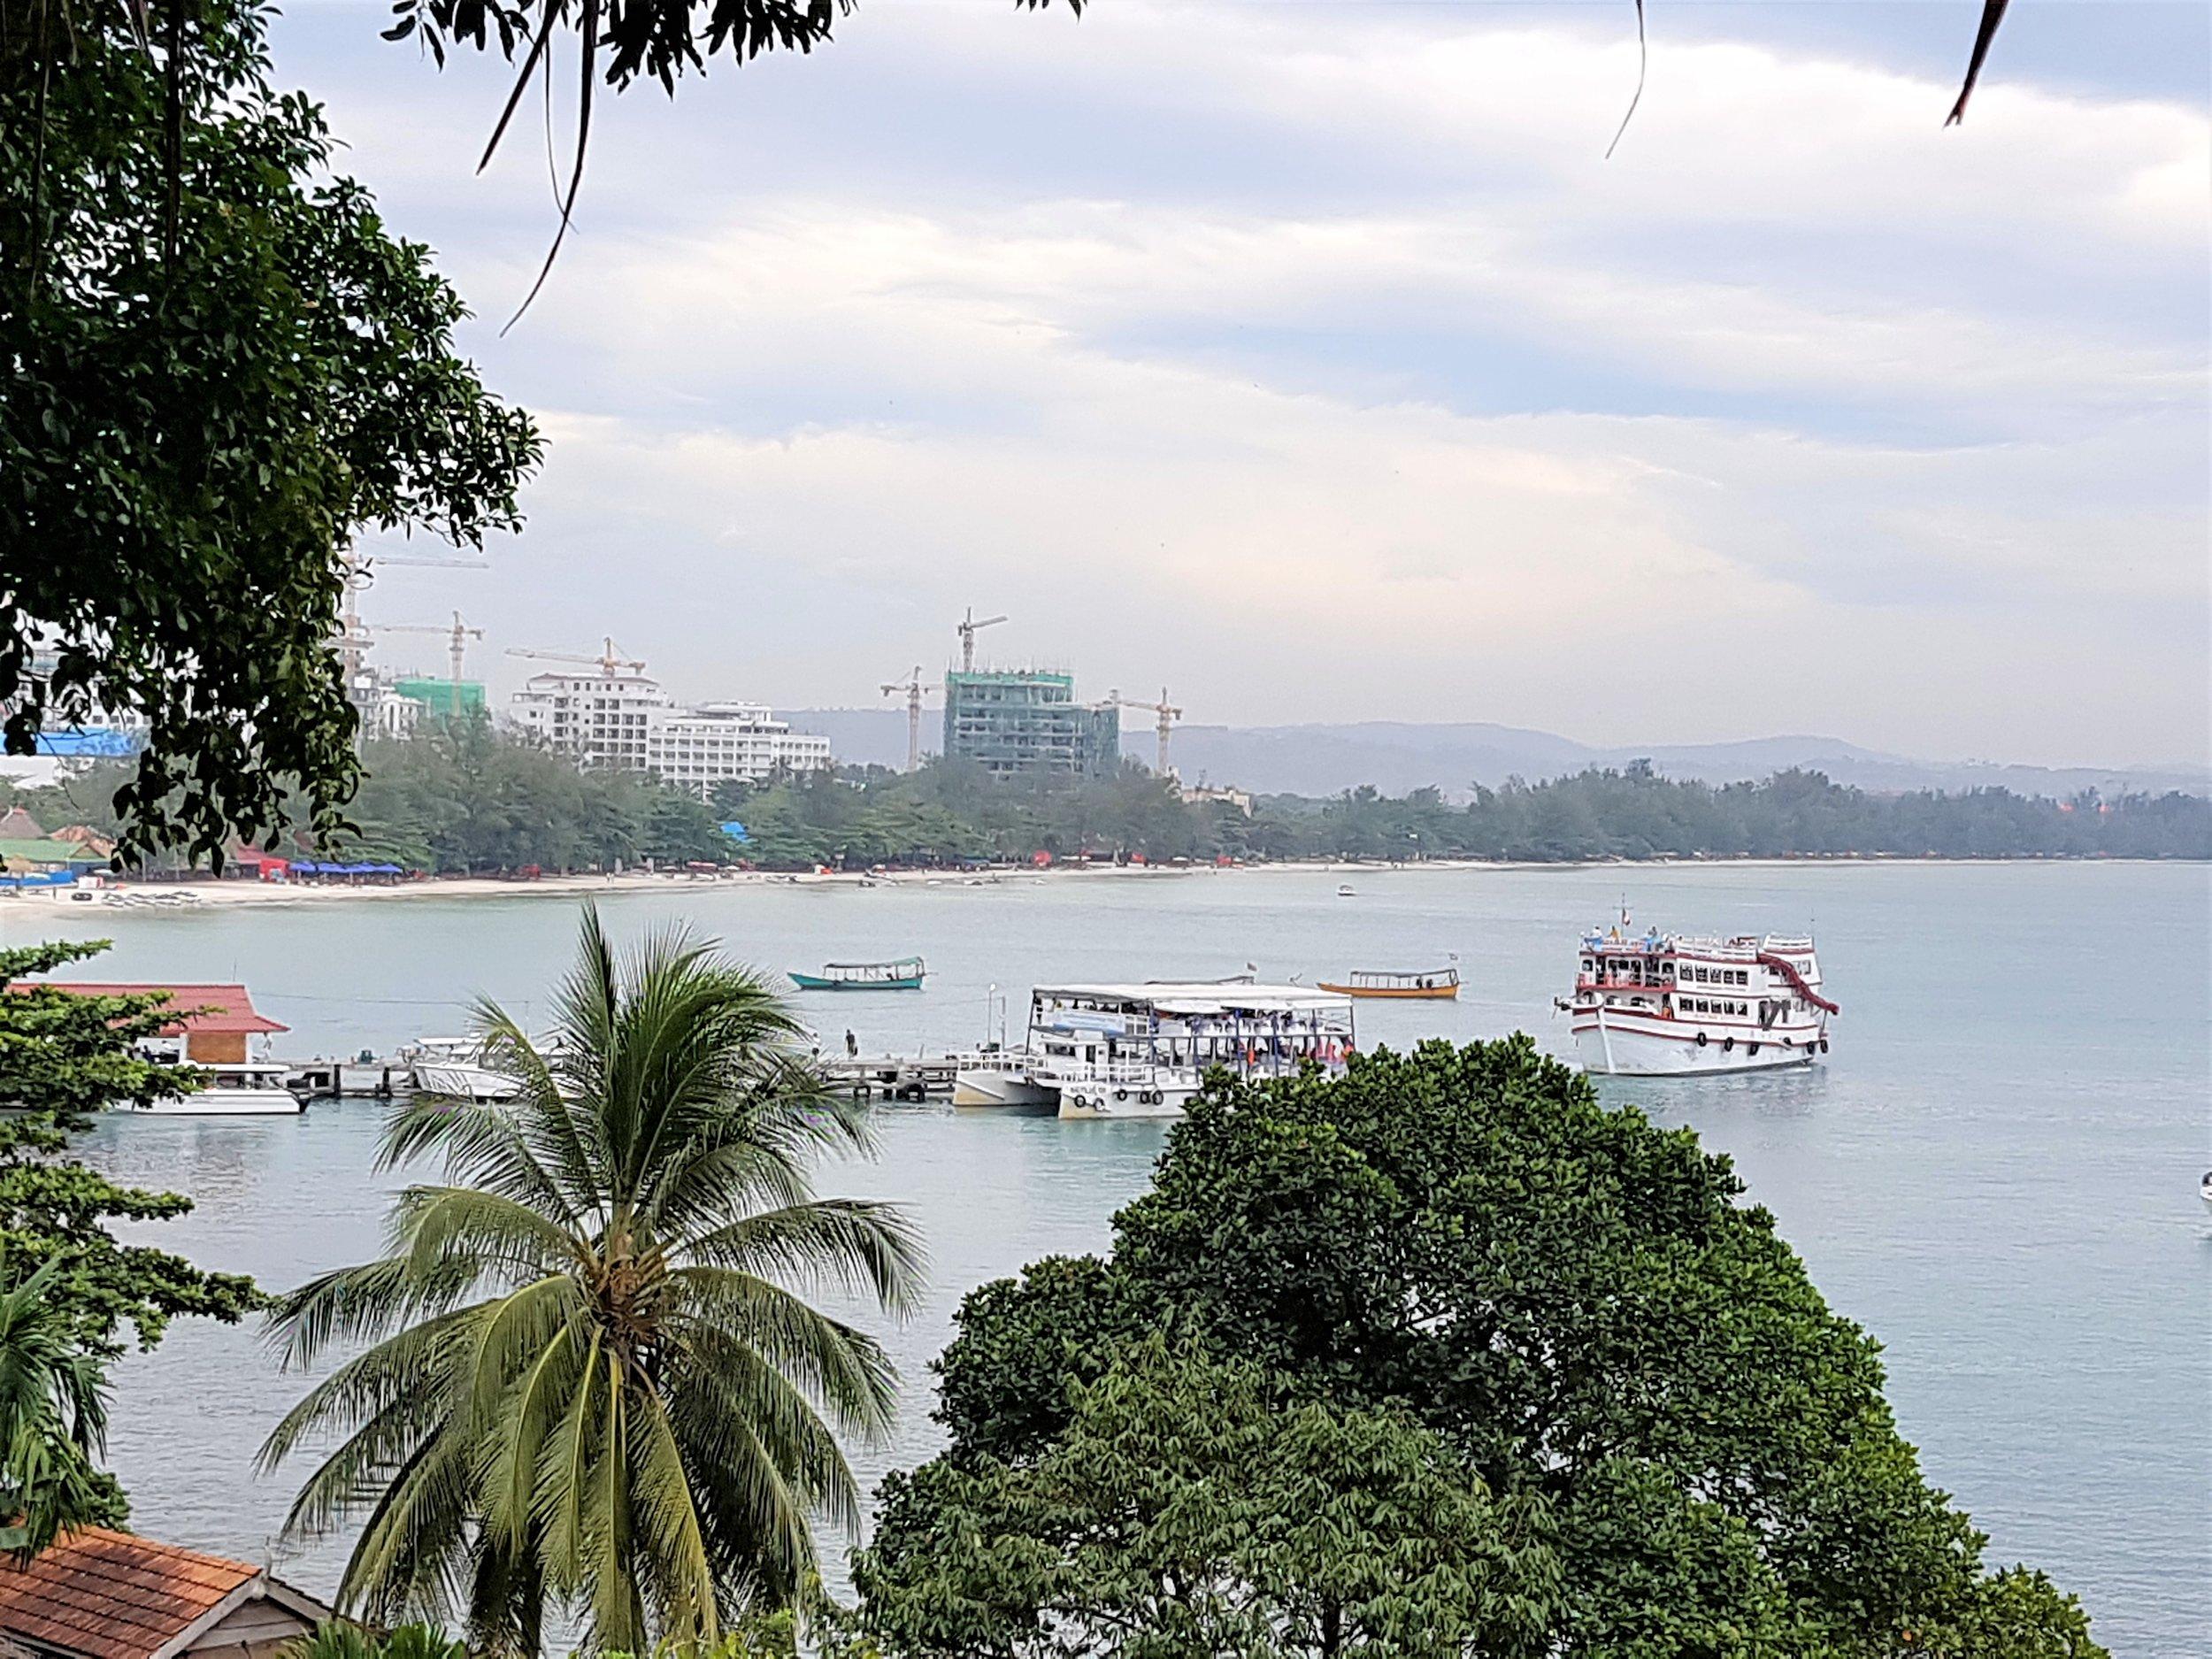 Building cranes dominate Sihanoukville skyline